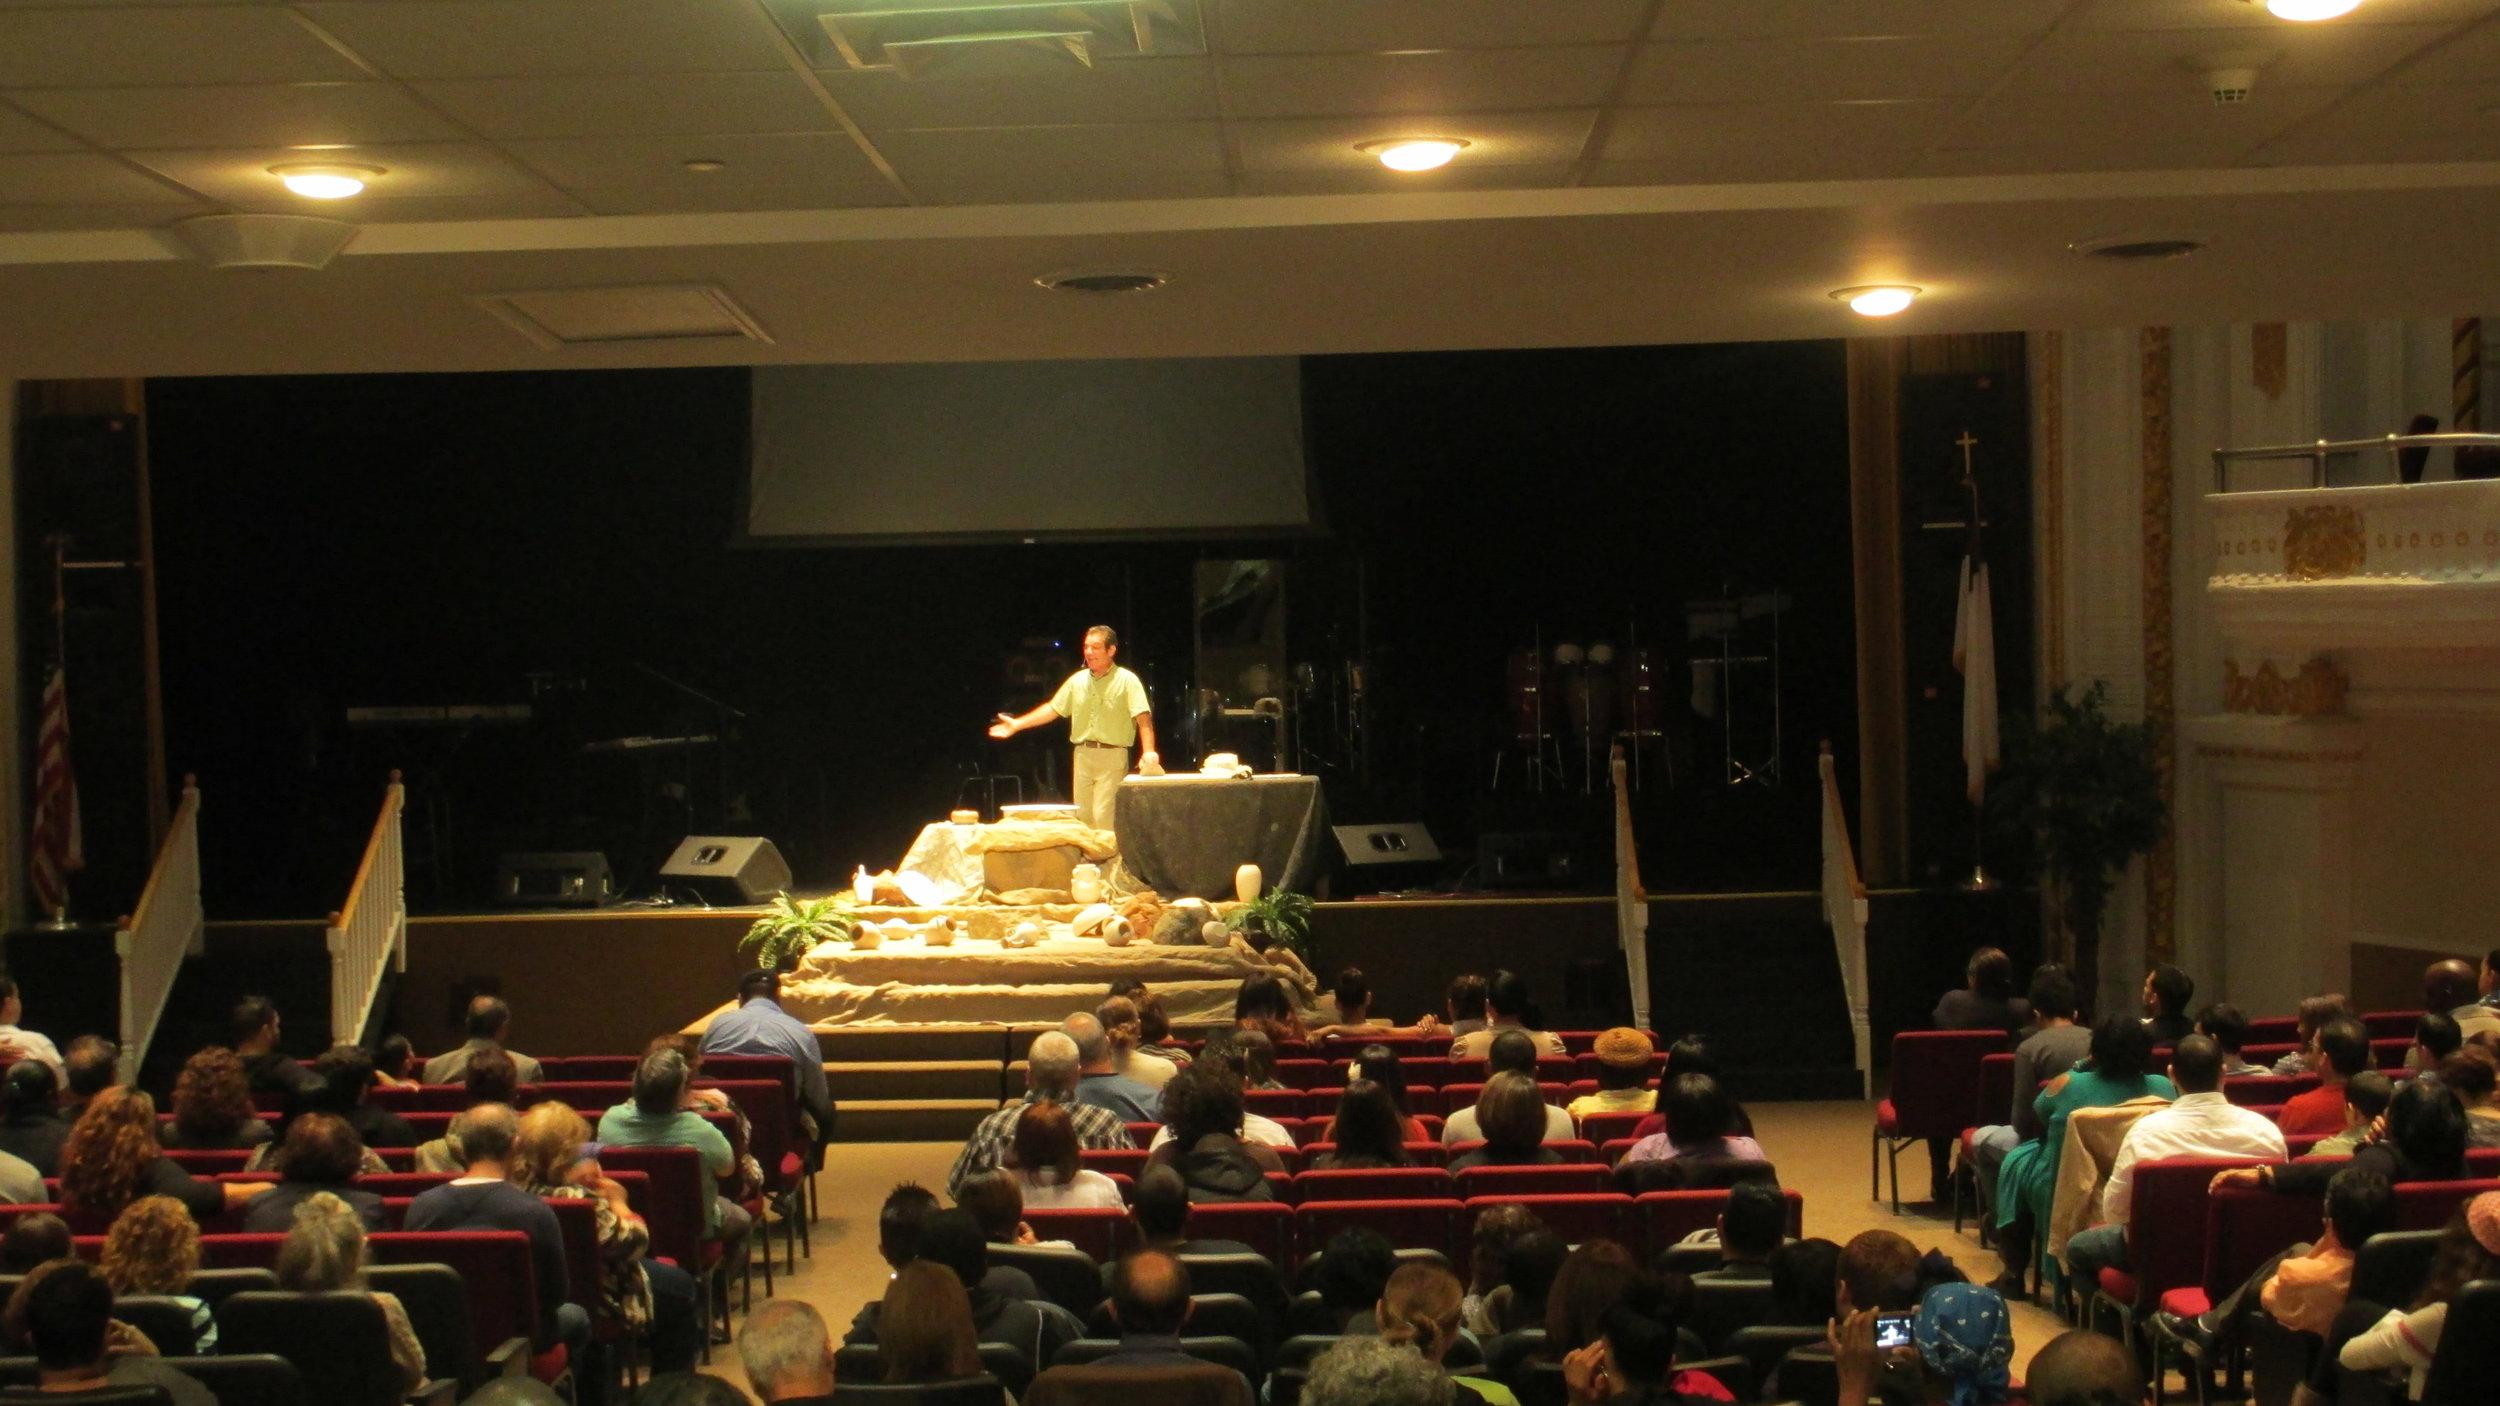 Christ Fellowship, Elizabeth, NJ 011.JPG